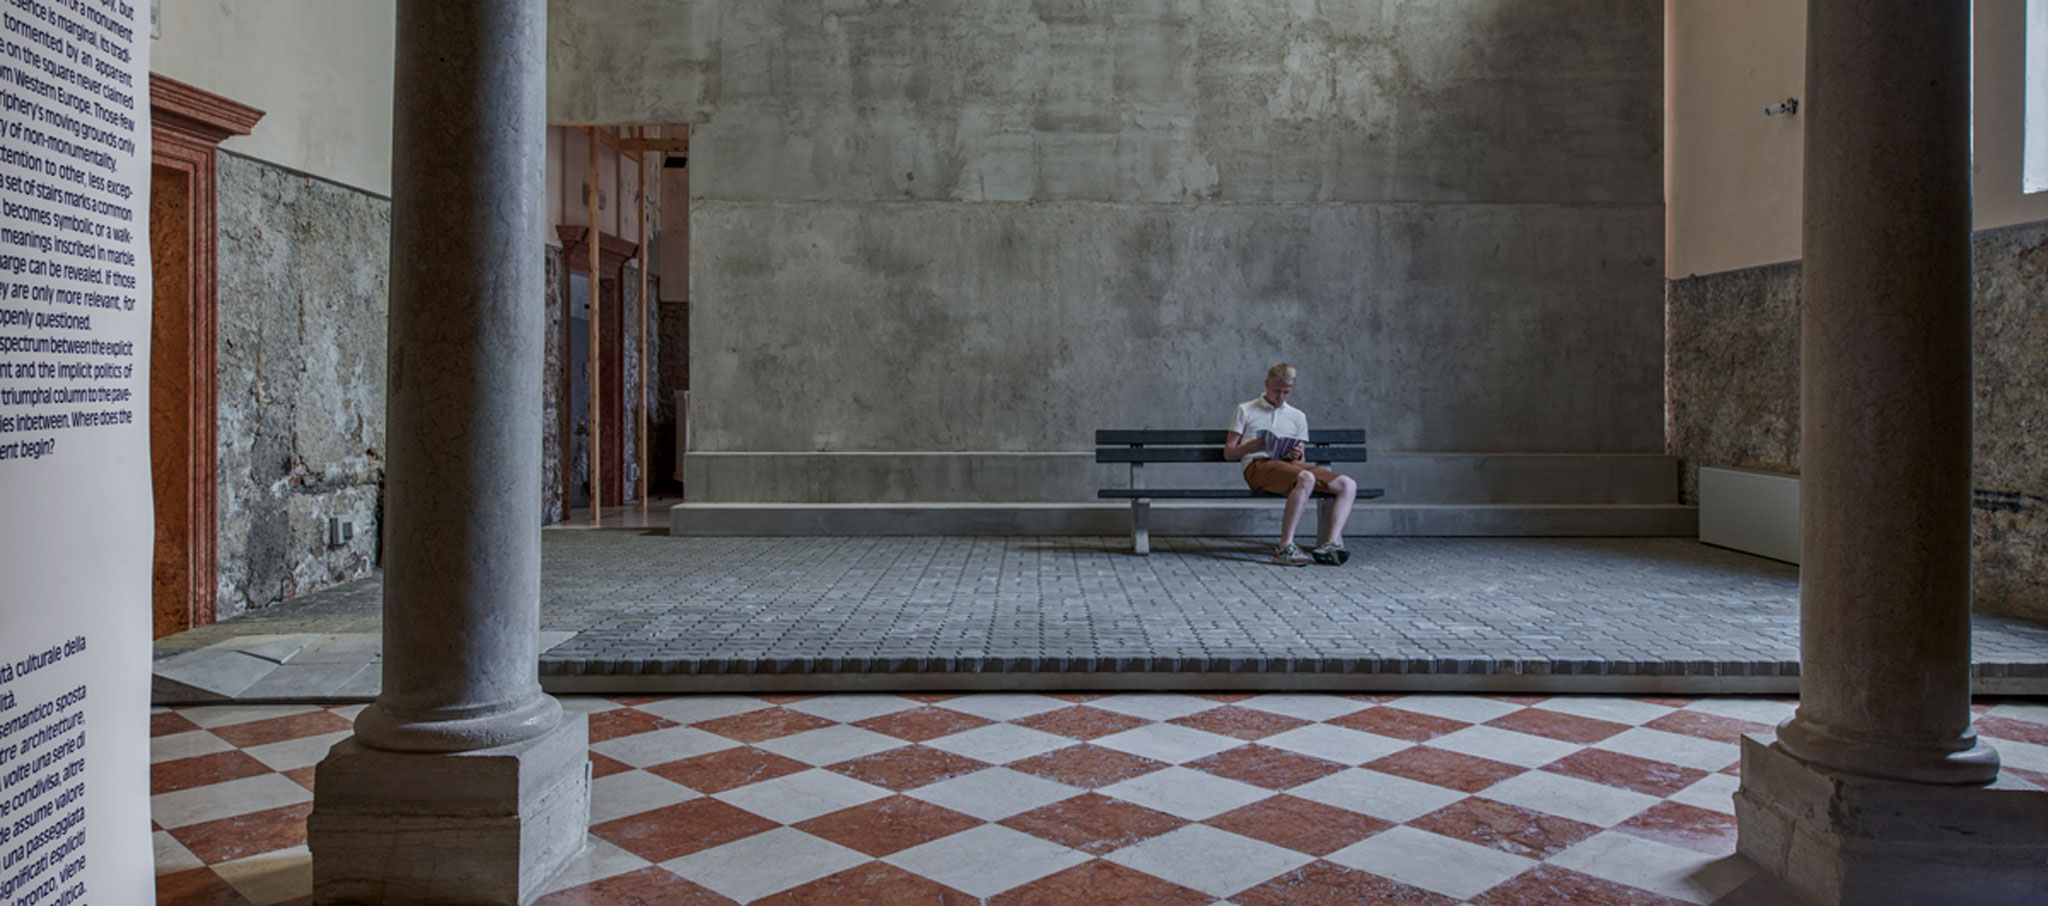 Entrance. Weak Monument. Estonian Pavilion at the 16th Biennale Architettura di Venezia 2018. Photography by Tõnu Tunnel